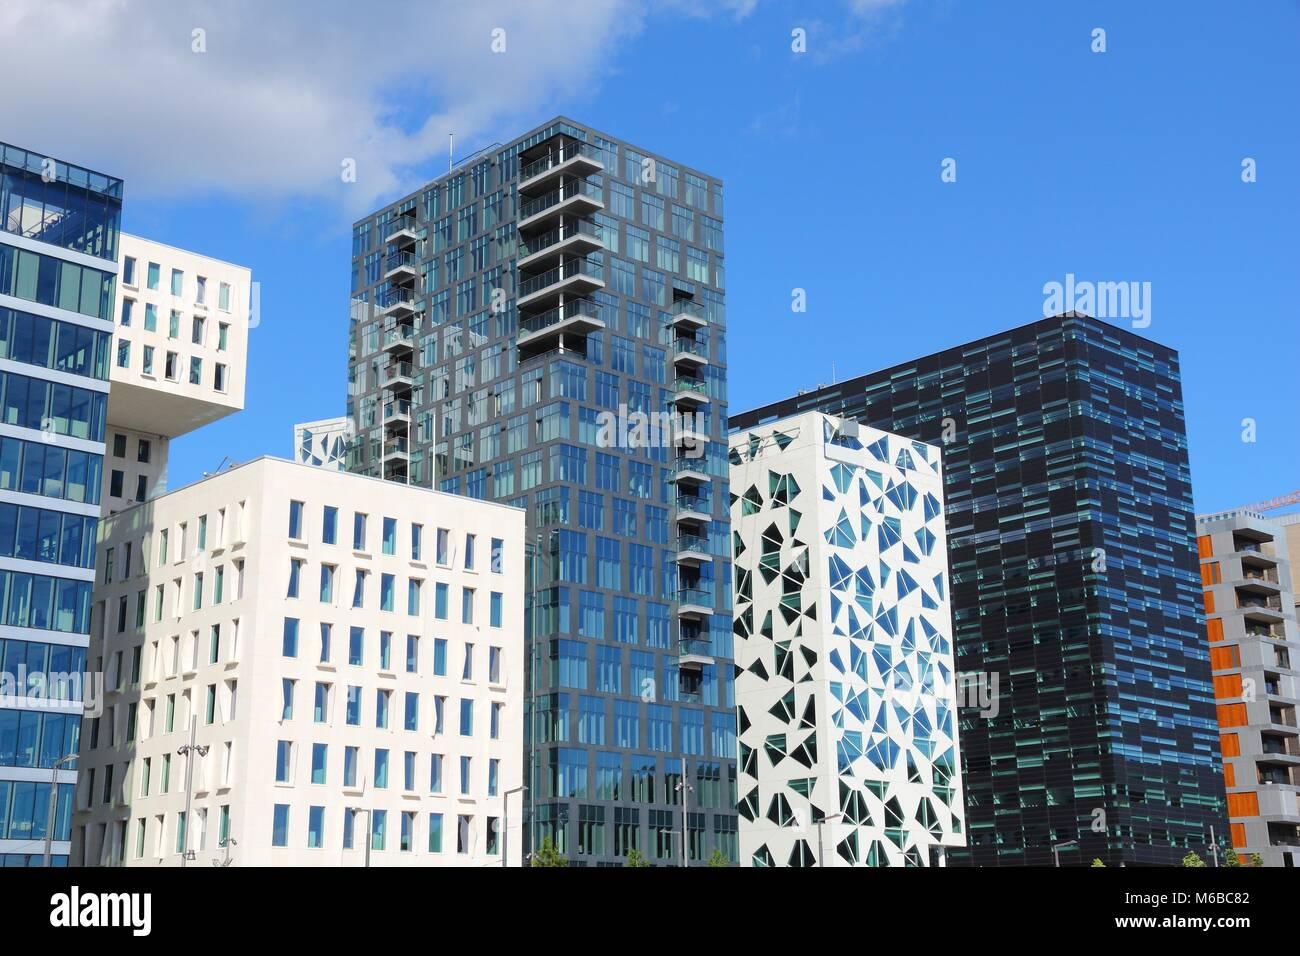 Modern Oslo skyline - Norway capital city. Bjorvika district. - Stock Image